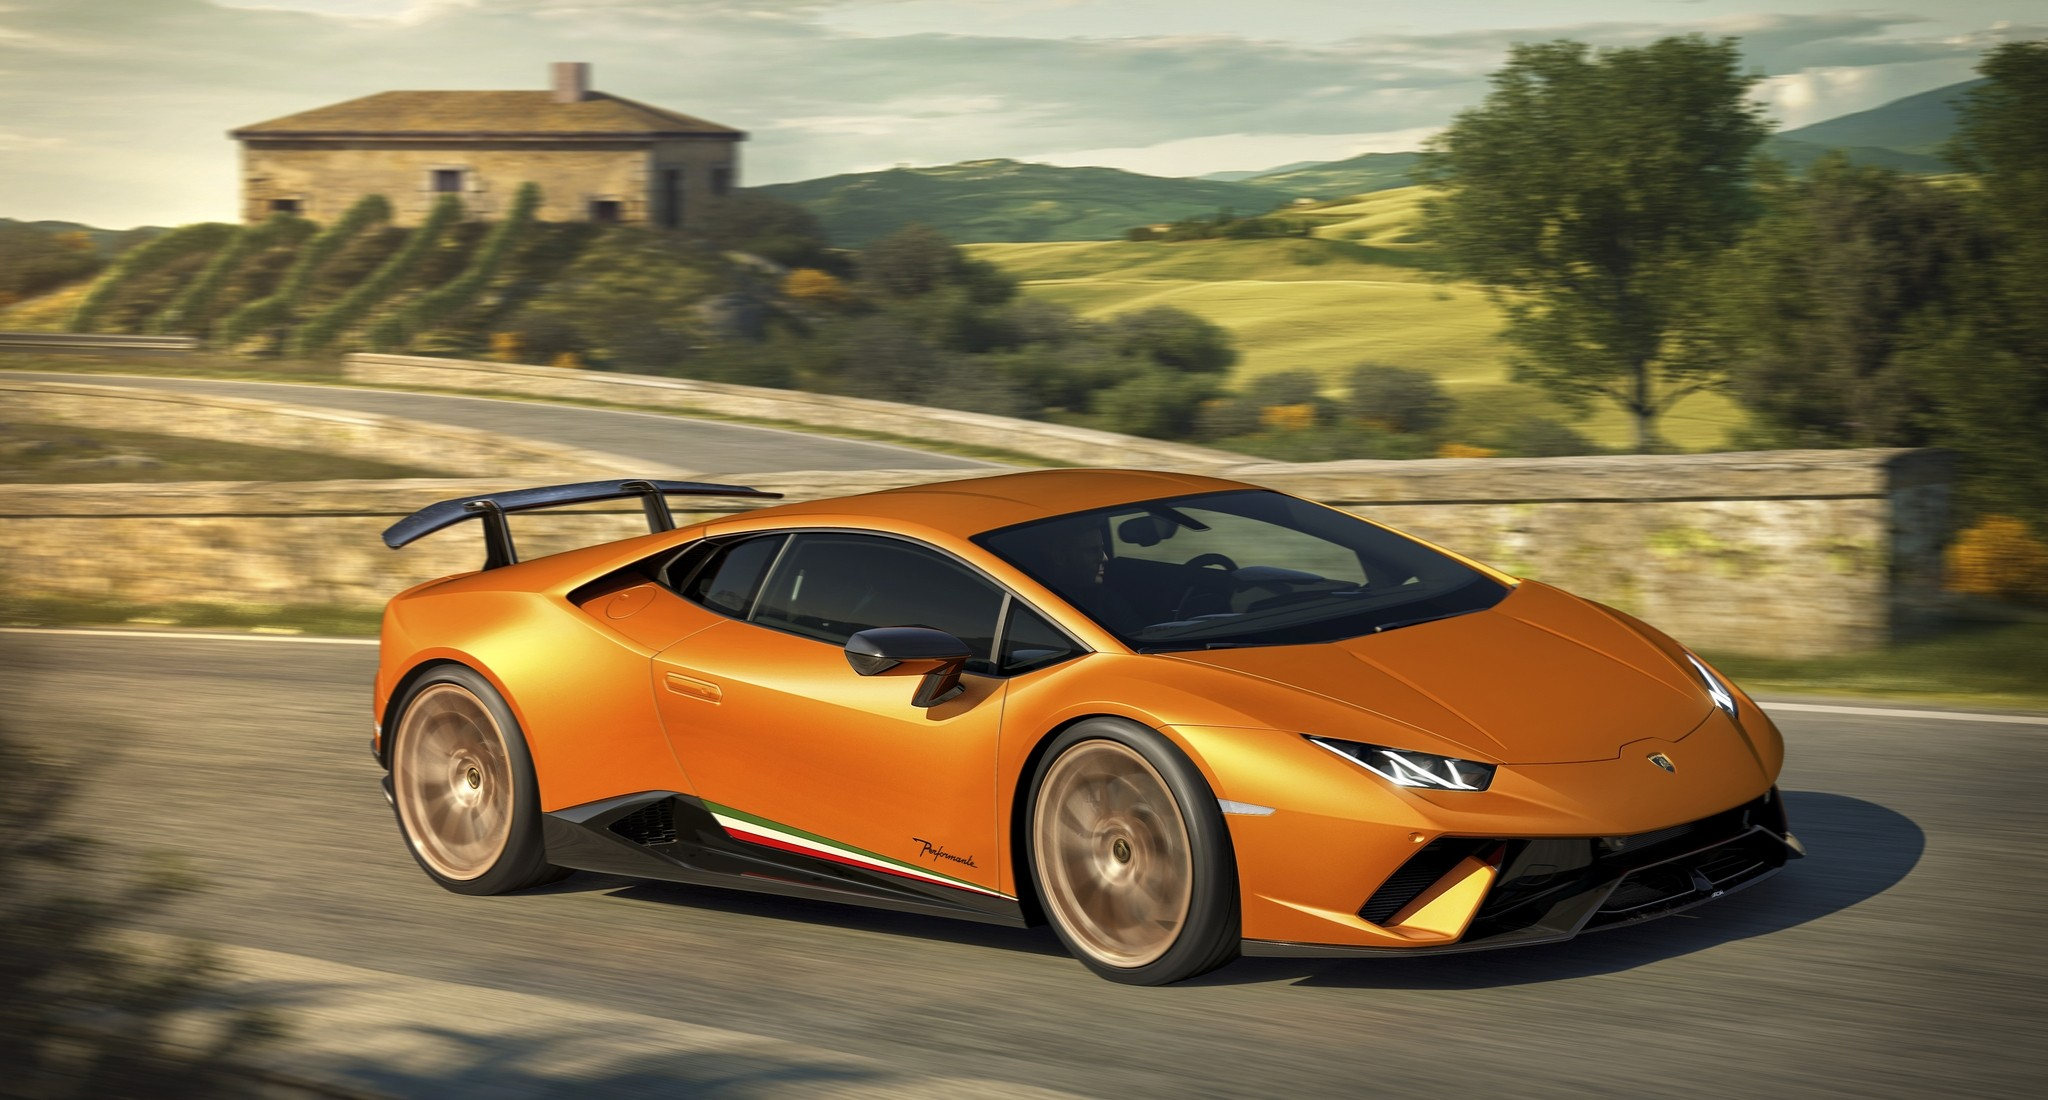 <p><span>Lamborghini Huracan Performante. Фото: &copy; Lamborghini</span></p>